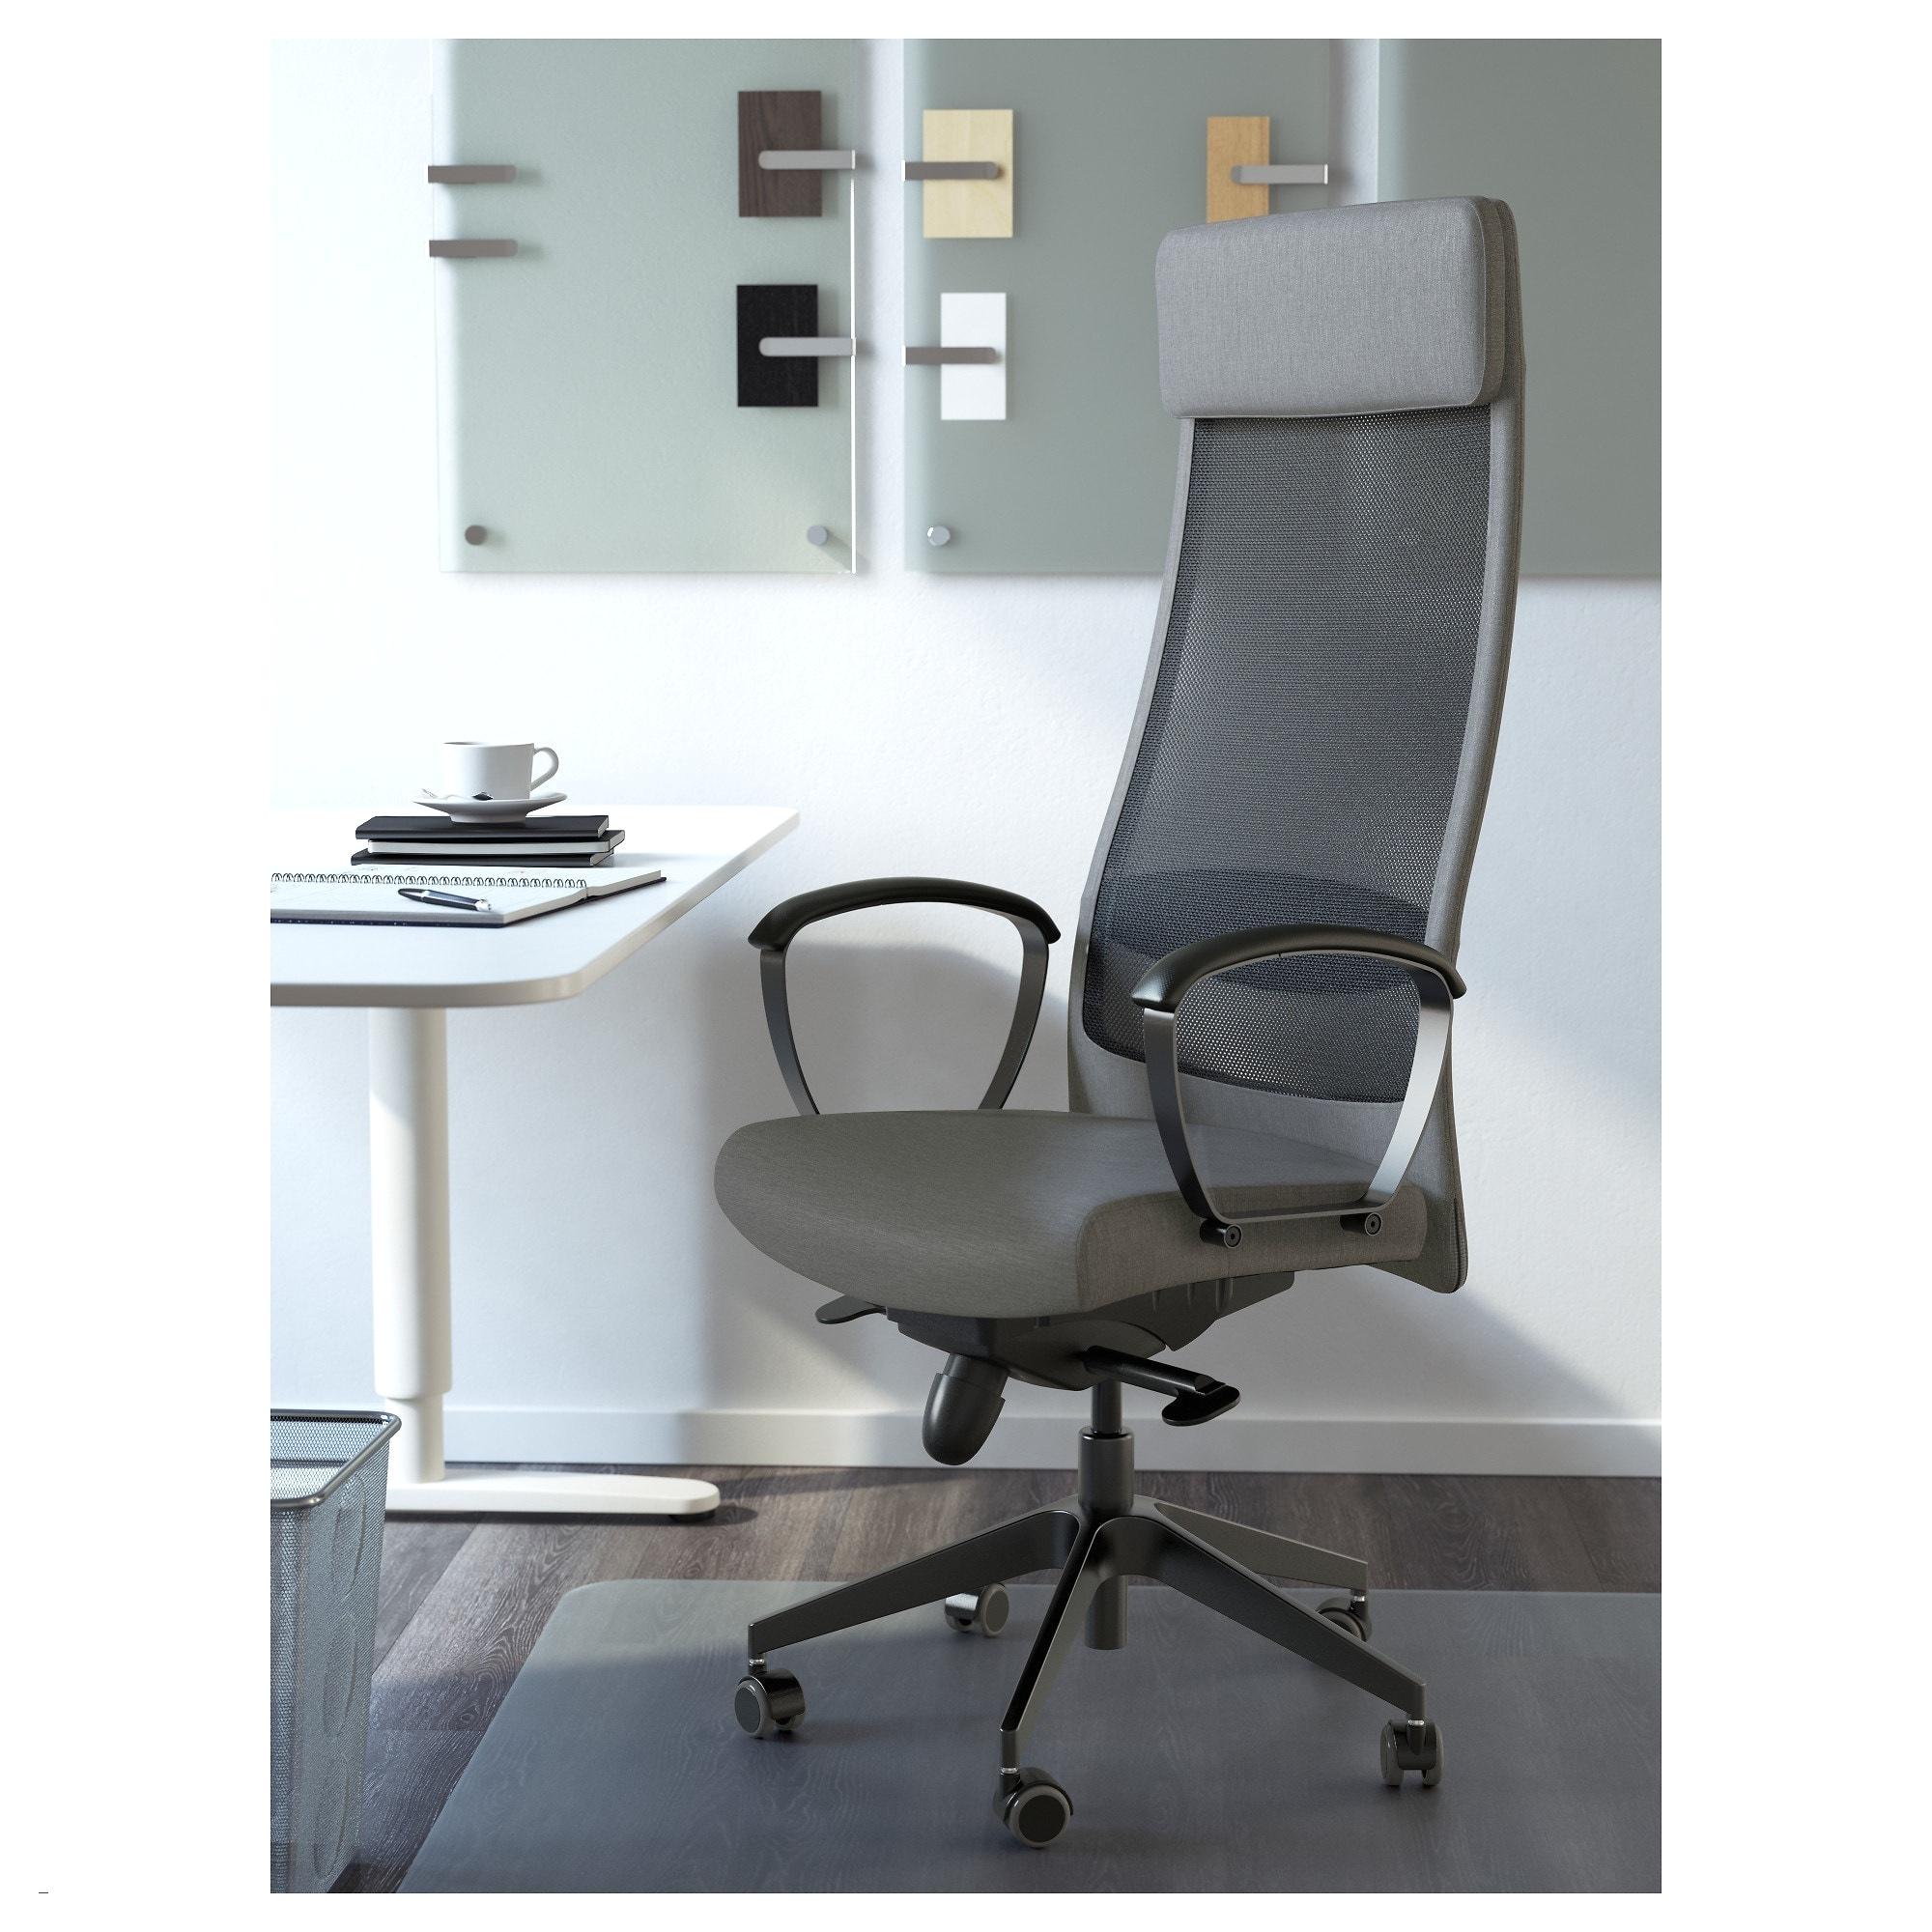 office furniture pittsburgh awesome markus swivel chair glose black ikea